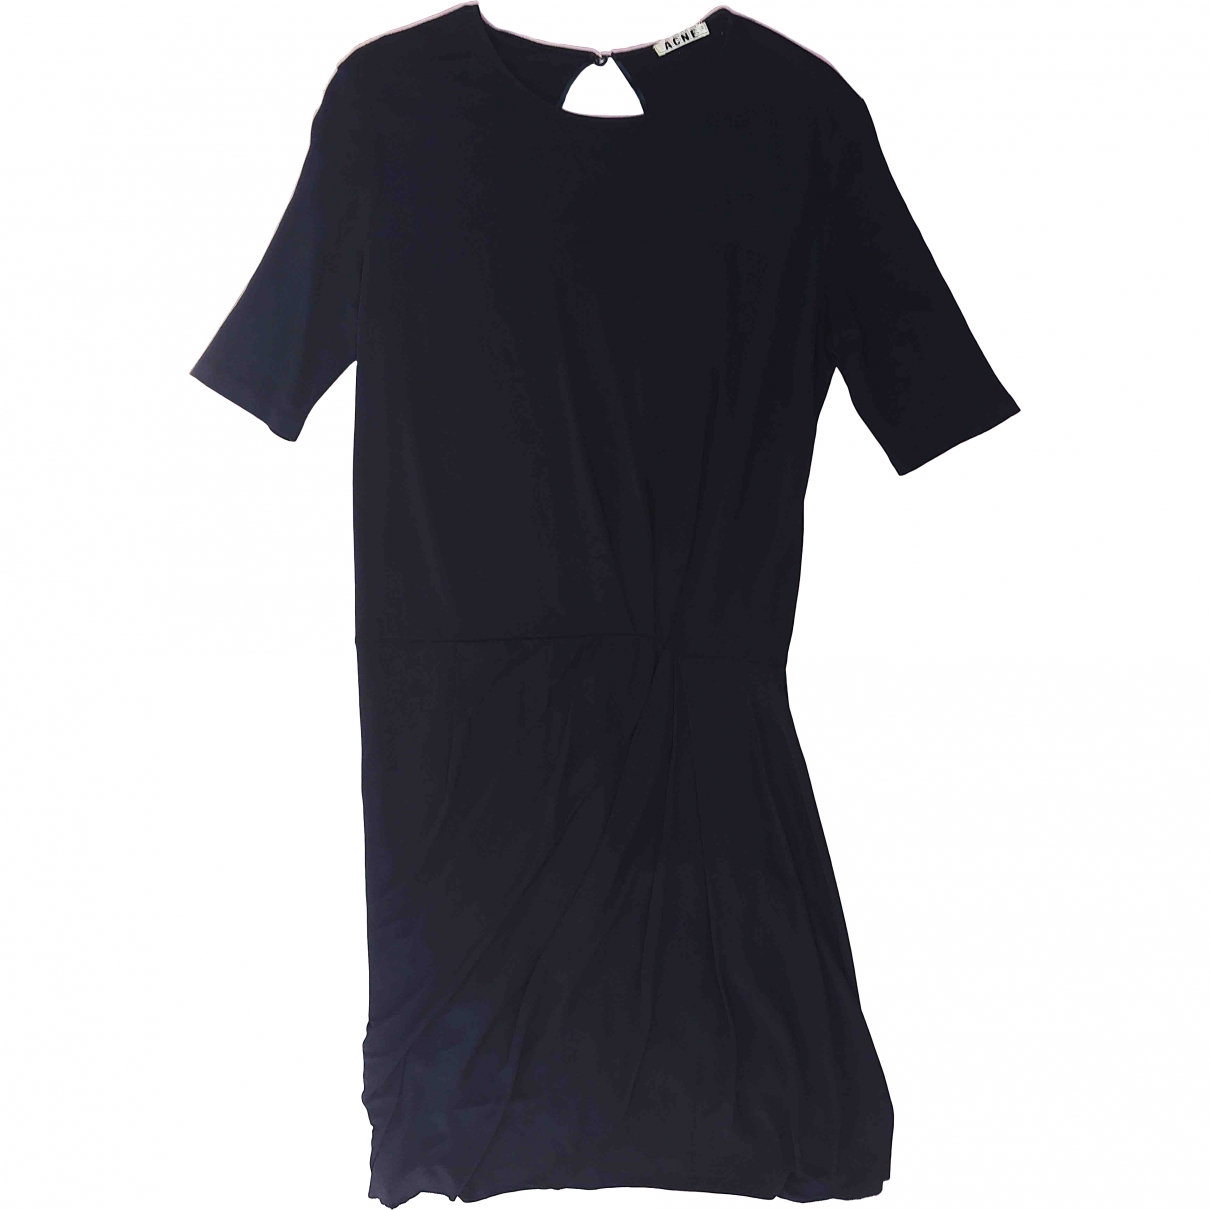 Acne Studios \N Blue dress for Women L International